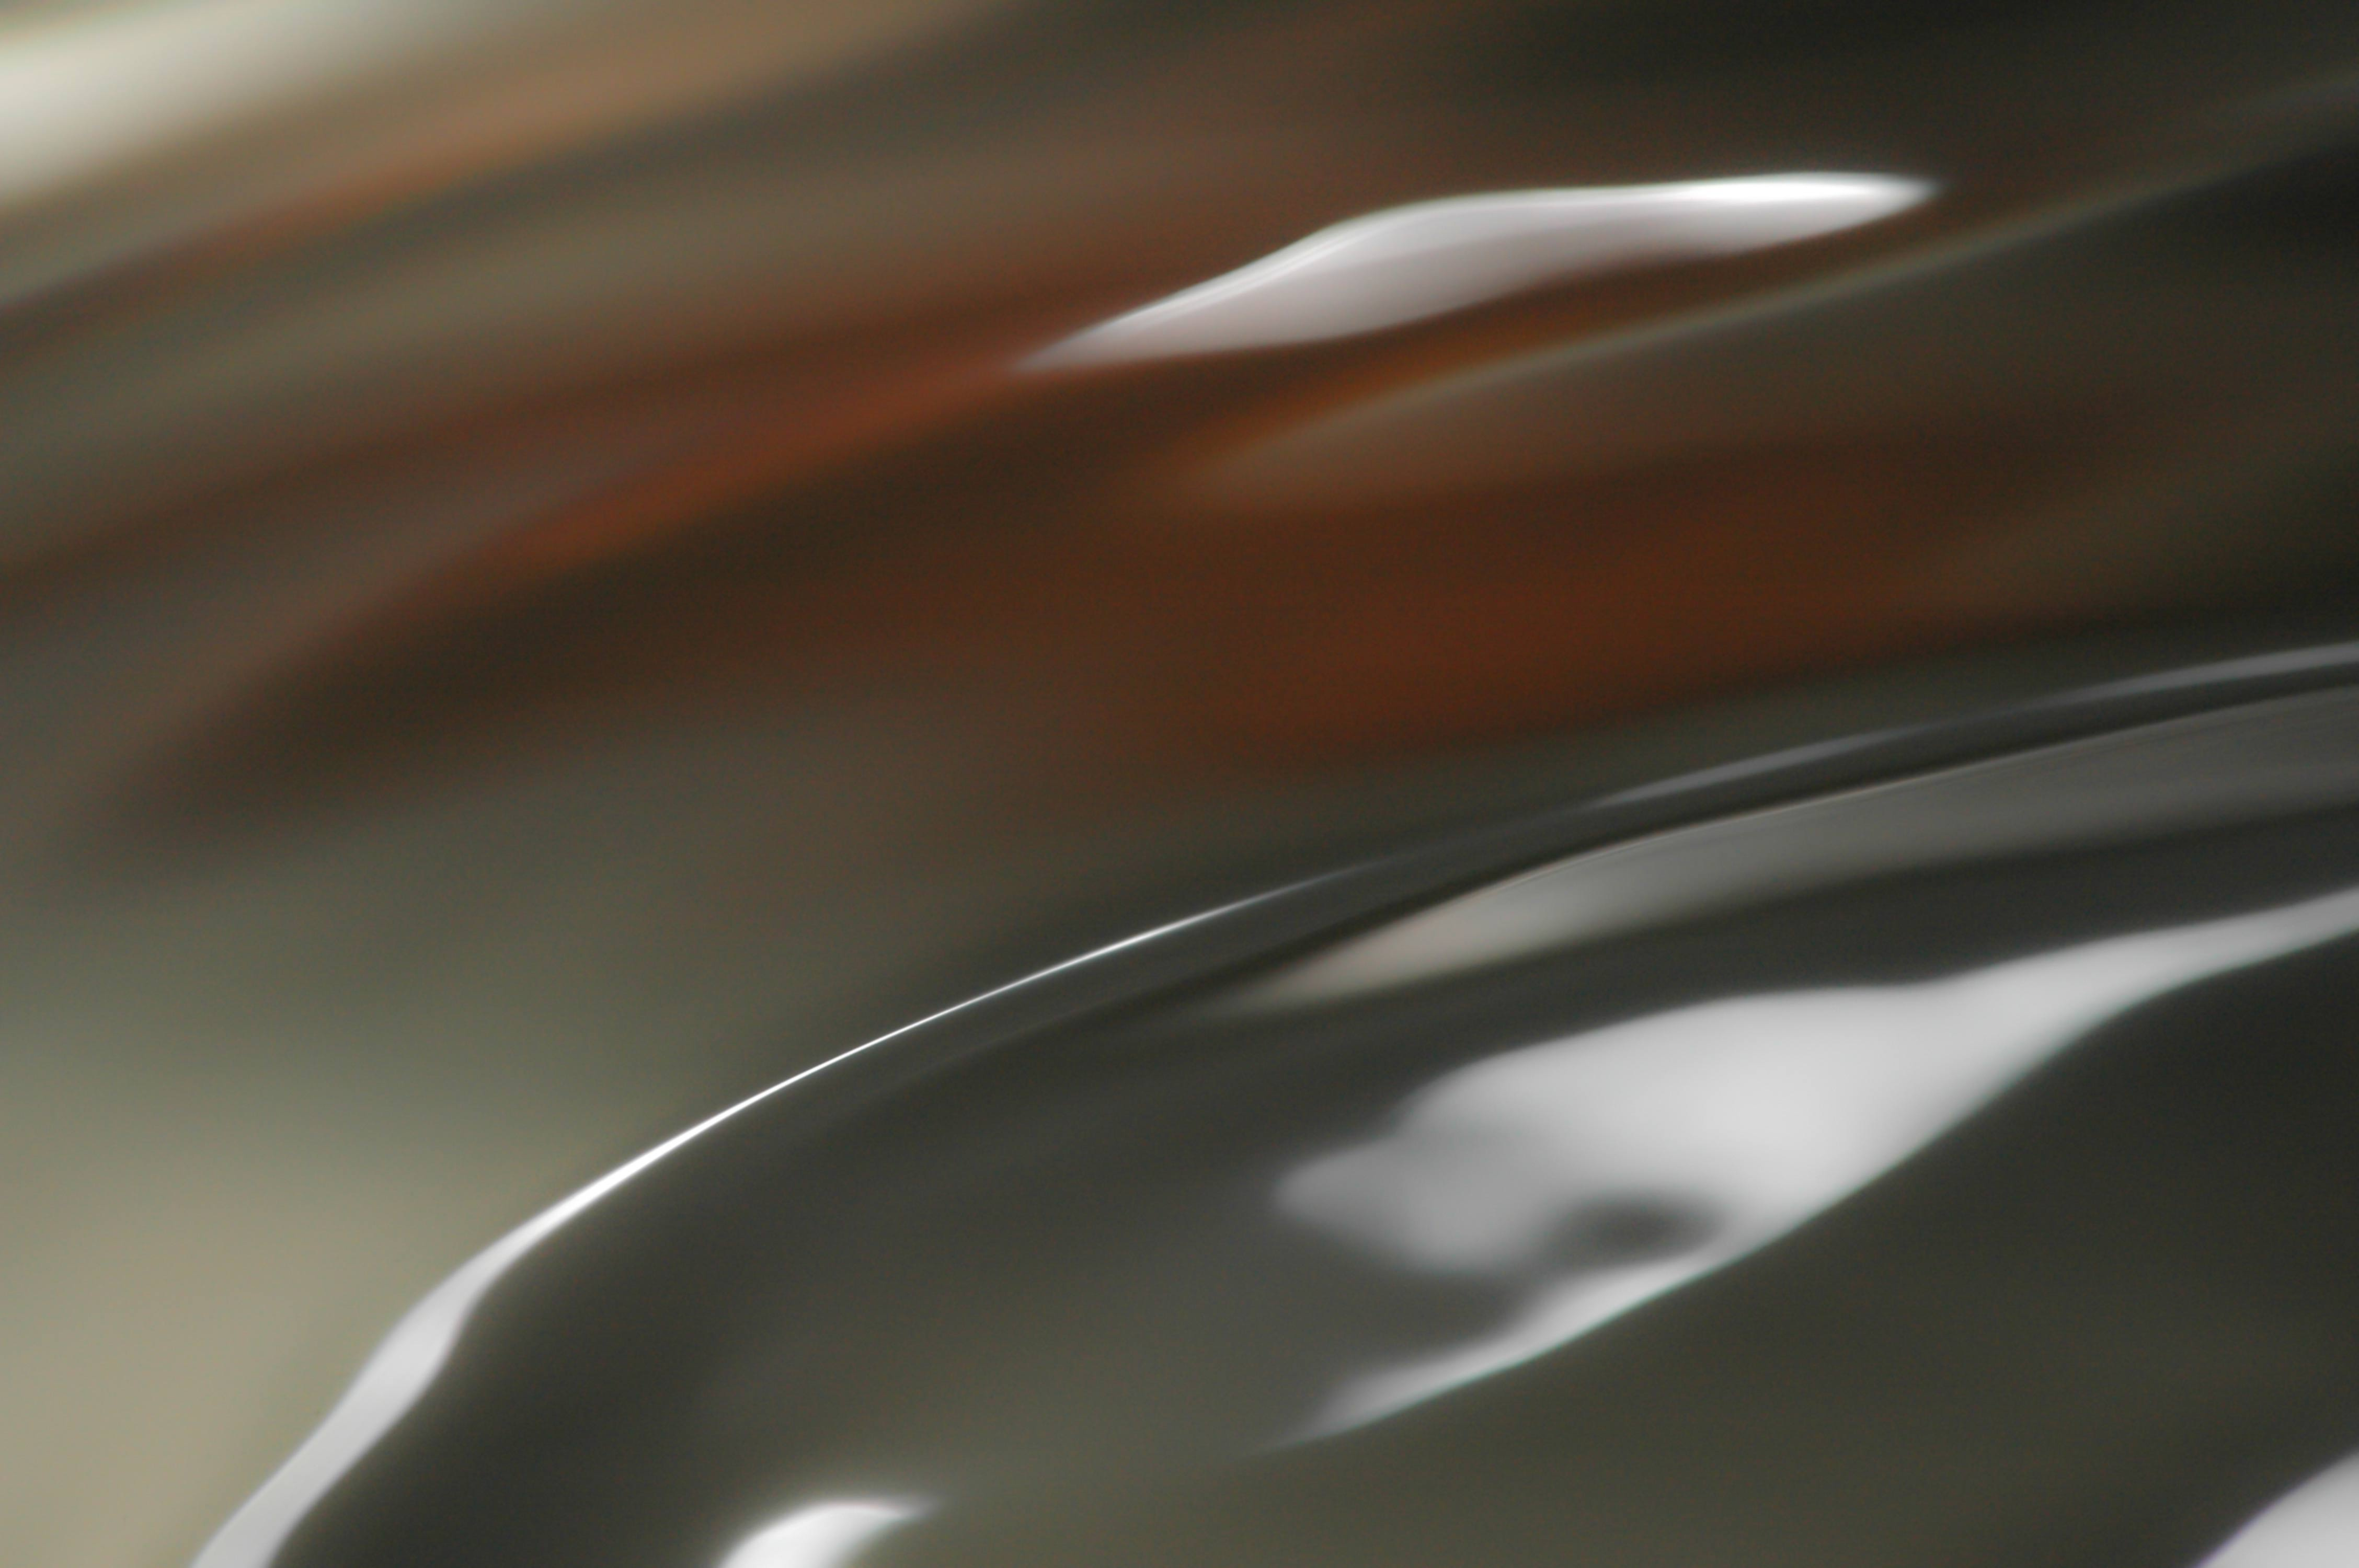 Abstract Liquid Flow